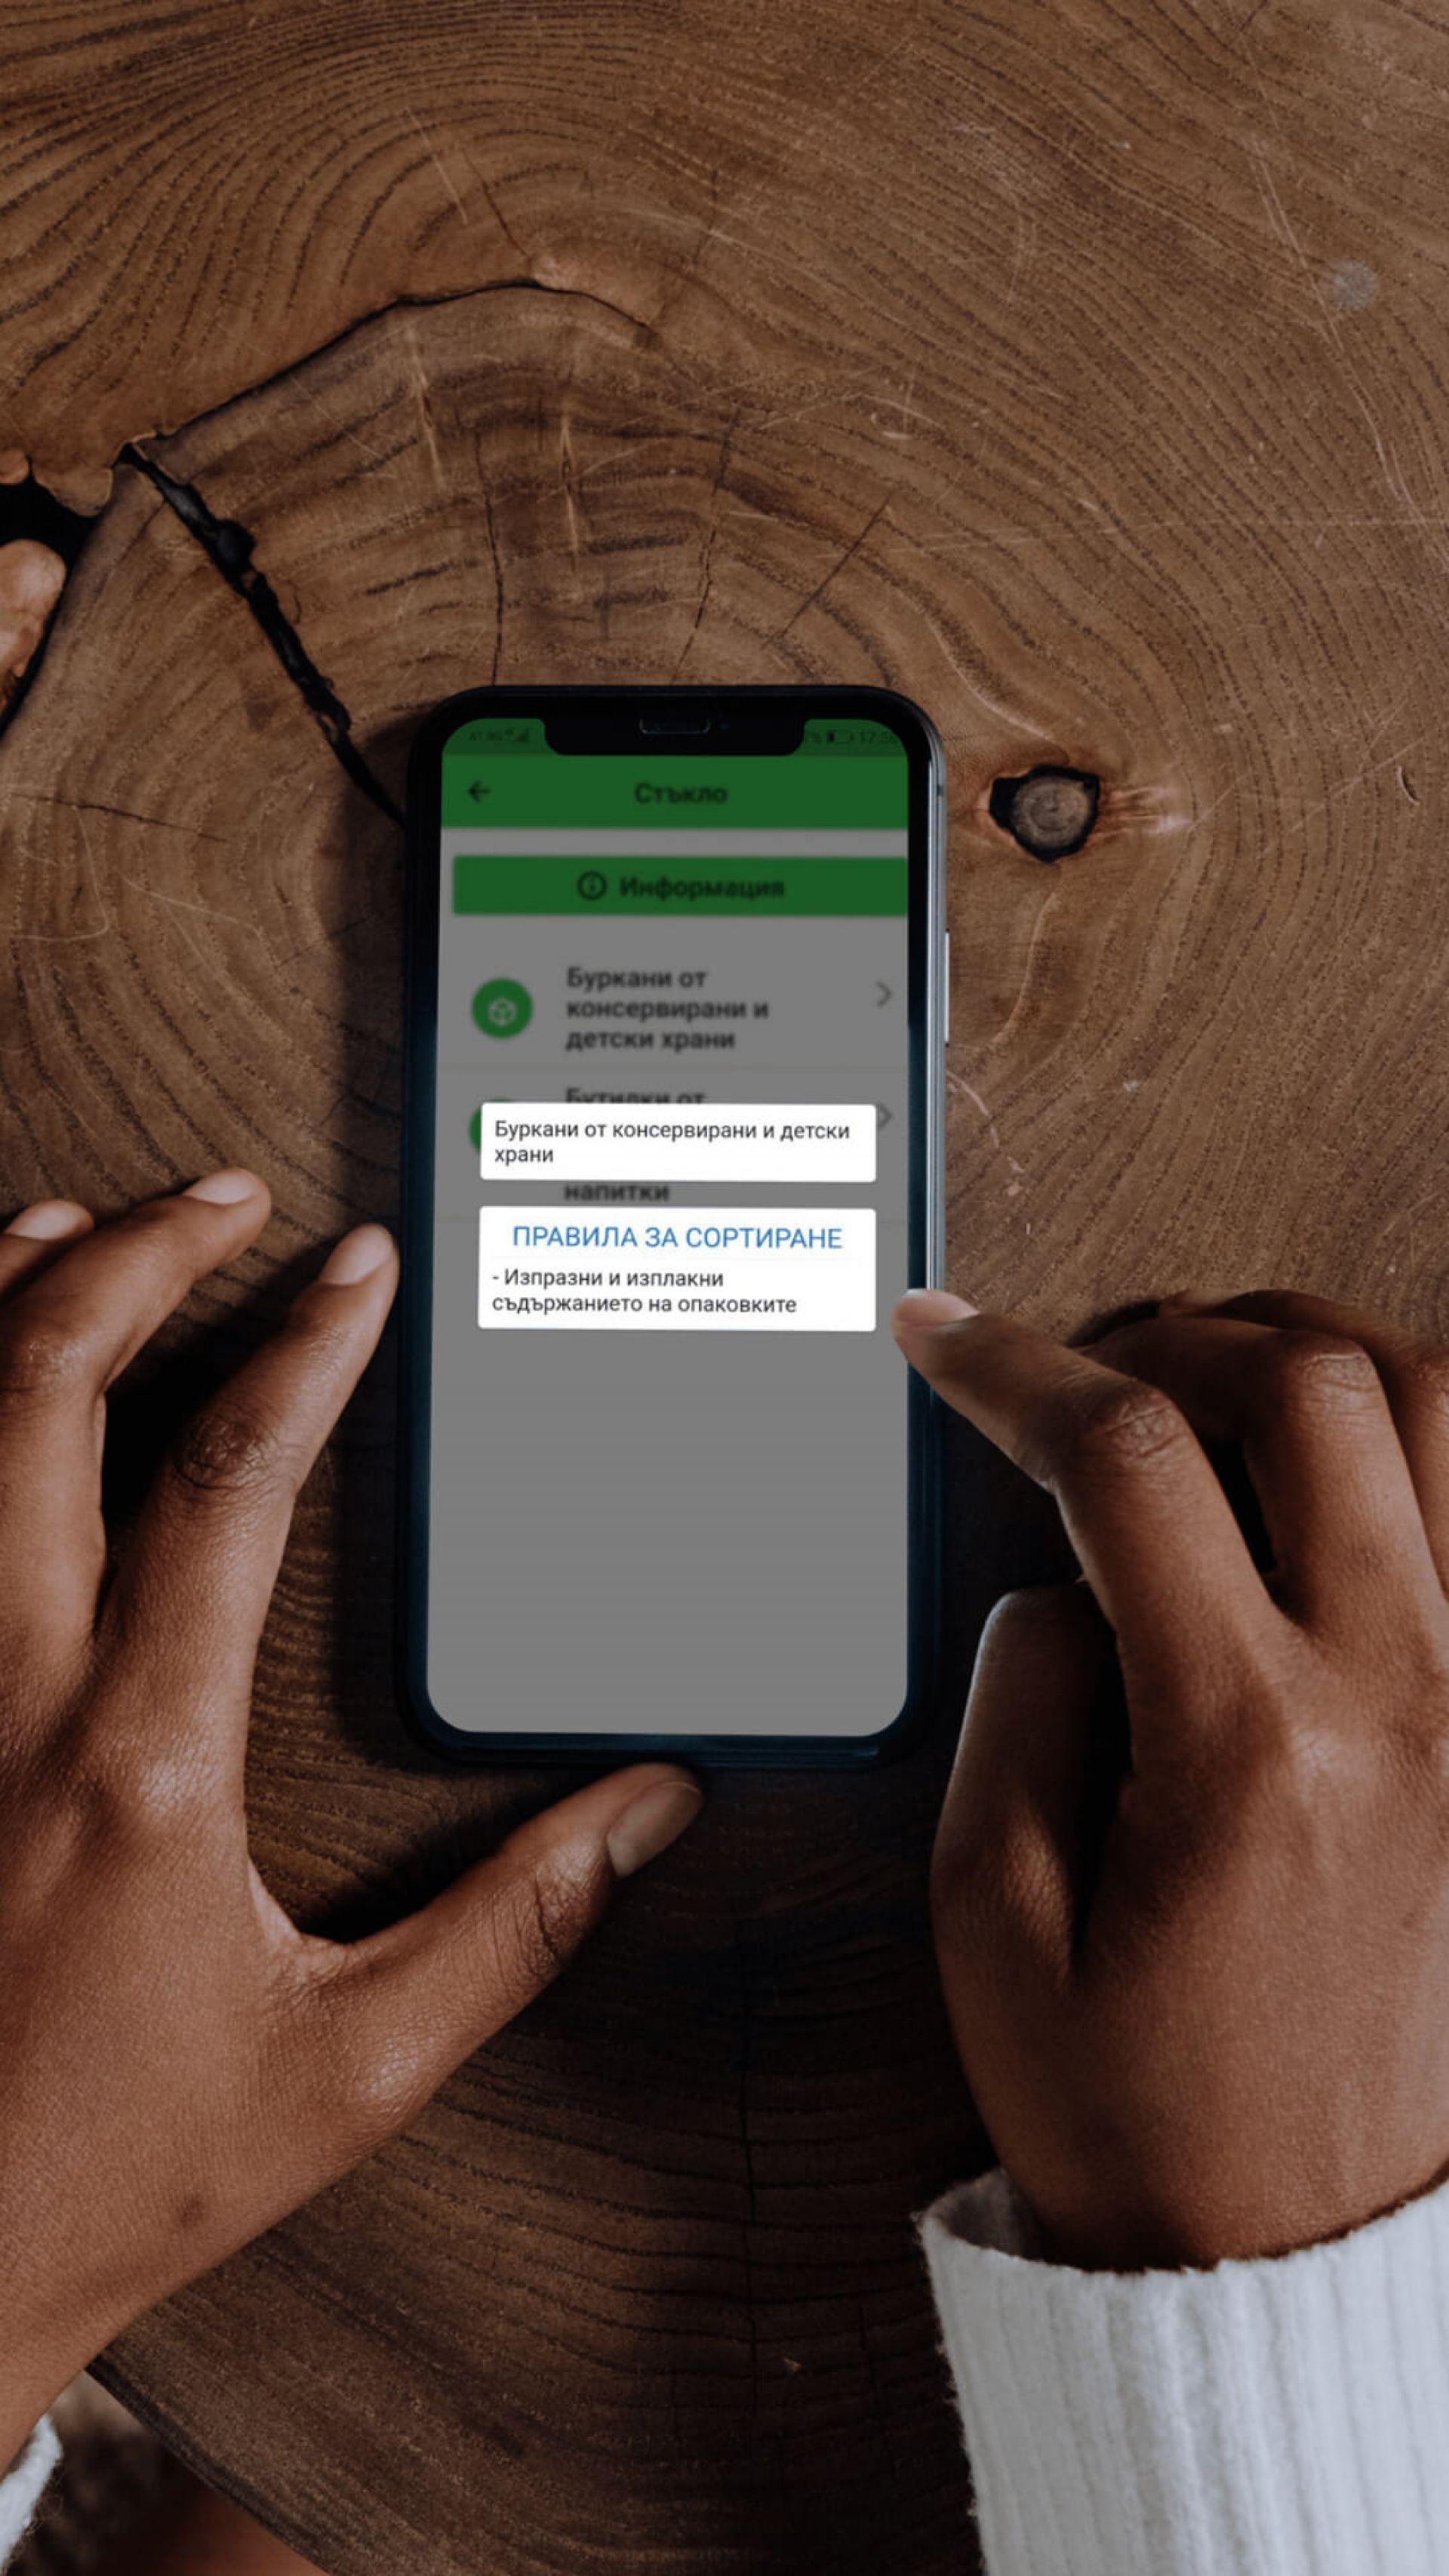 ЕКО Партнерс мобилно приложение